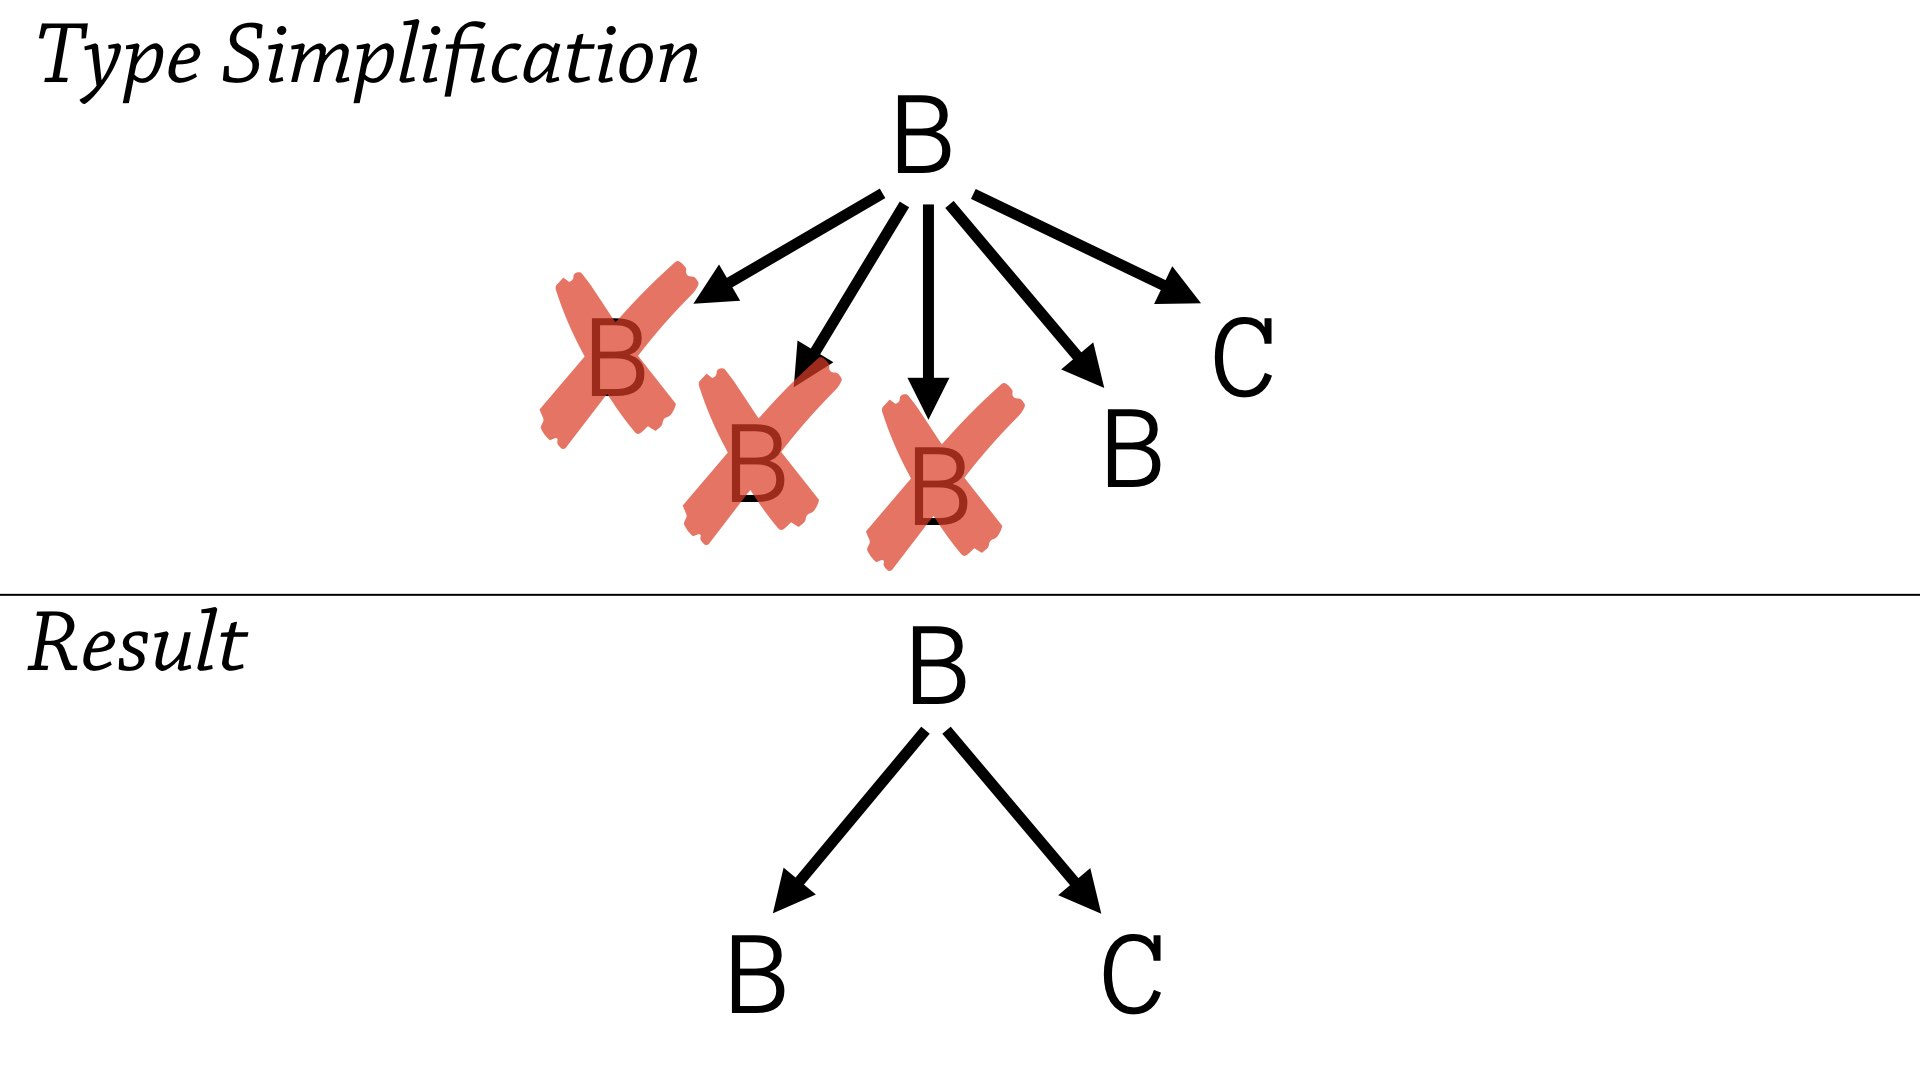 Type simplification